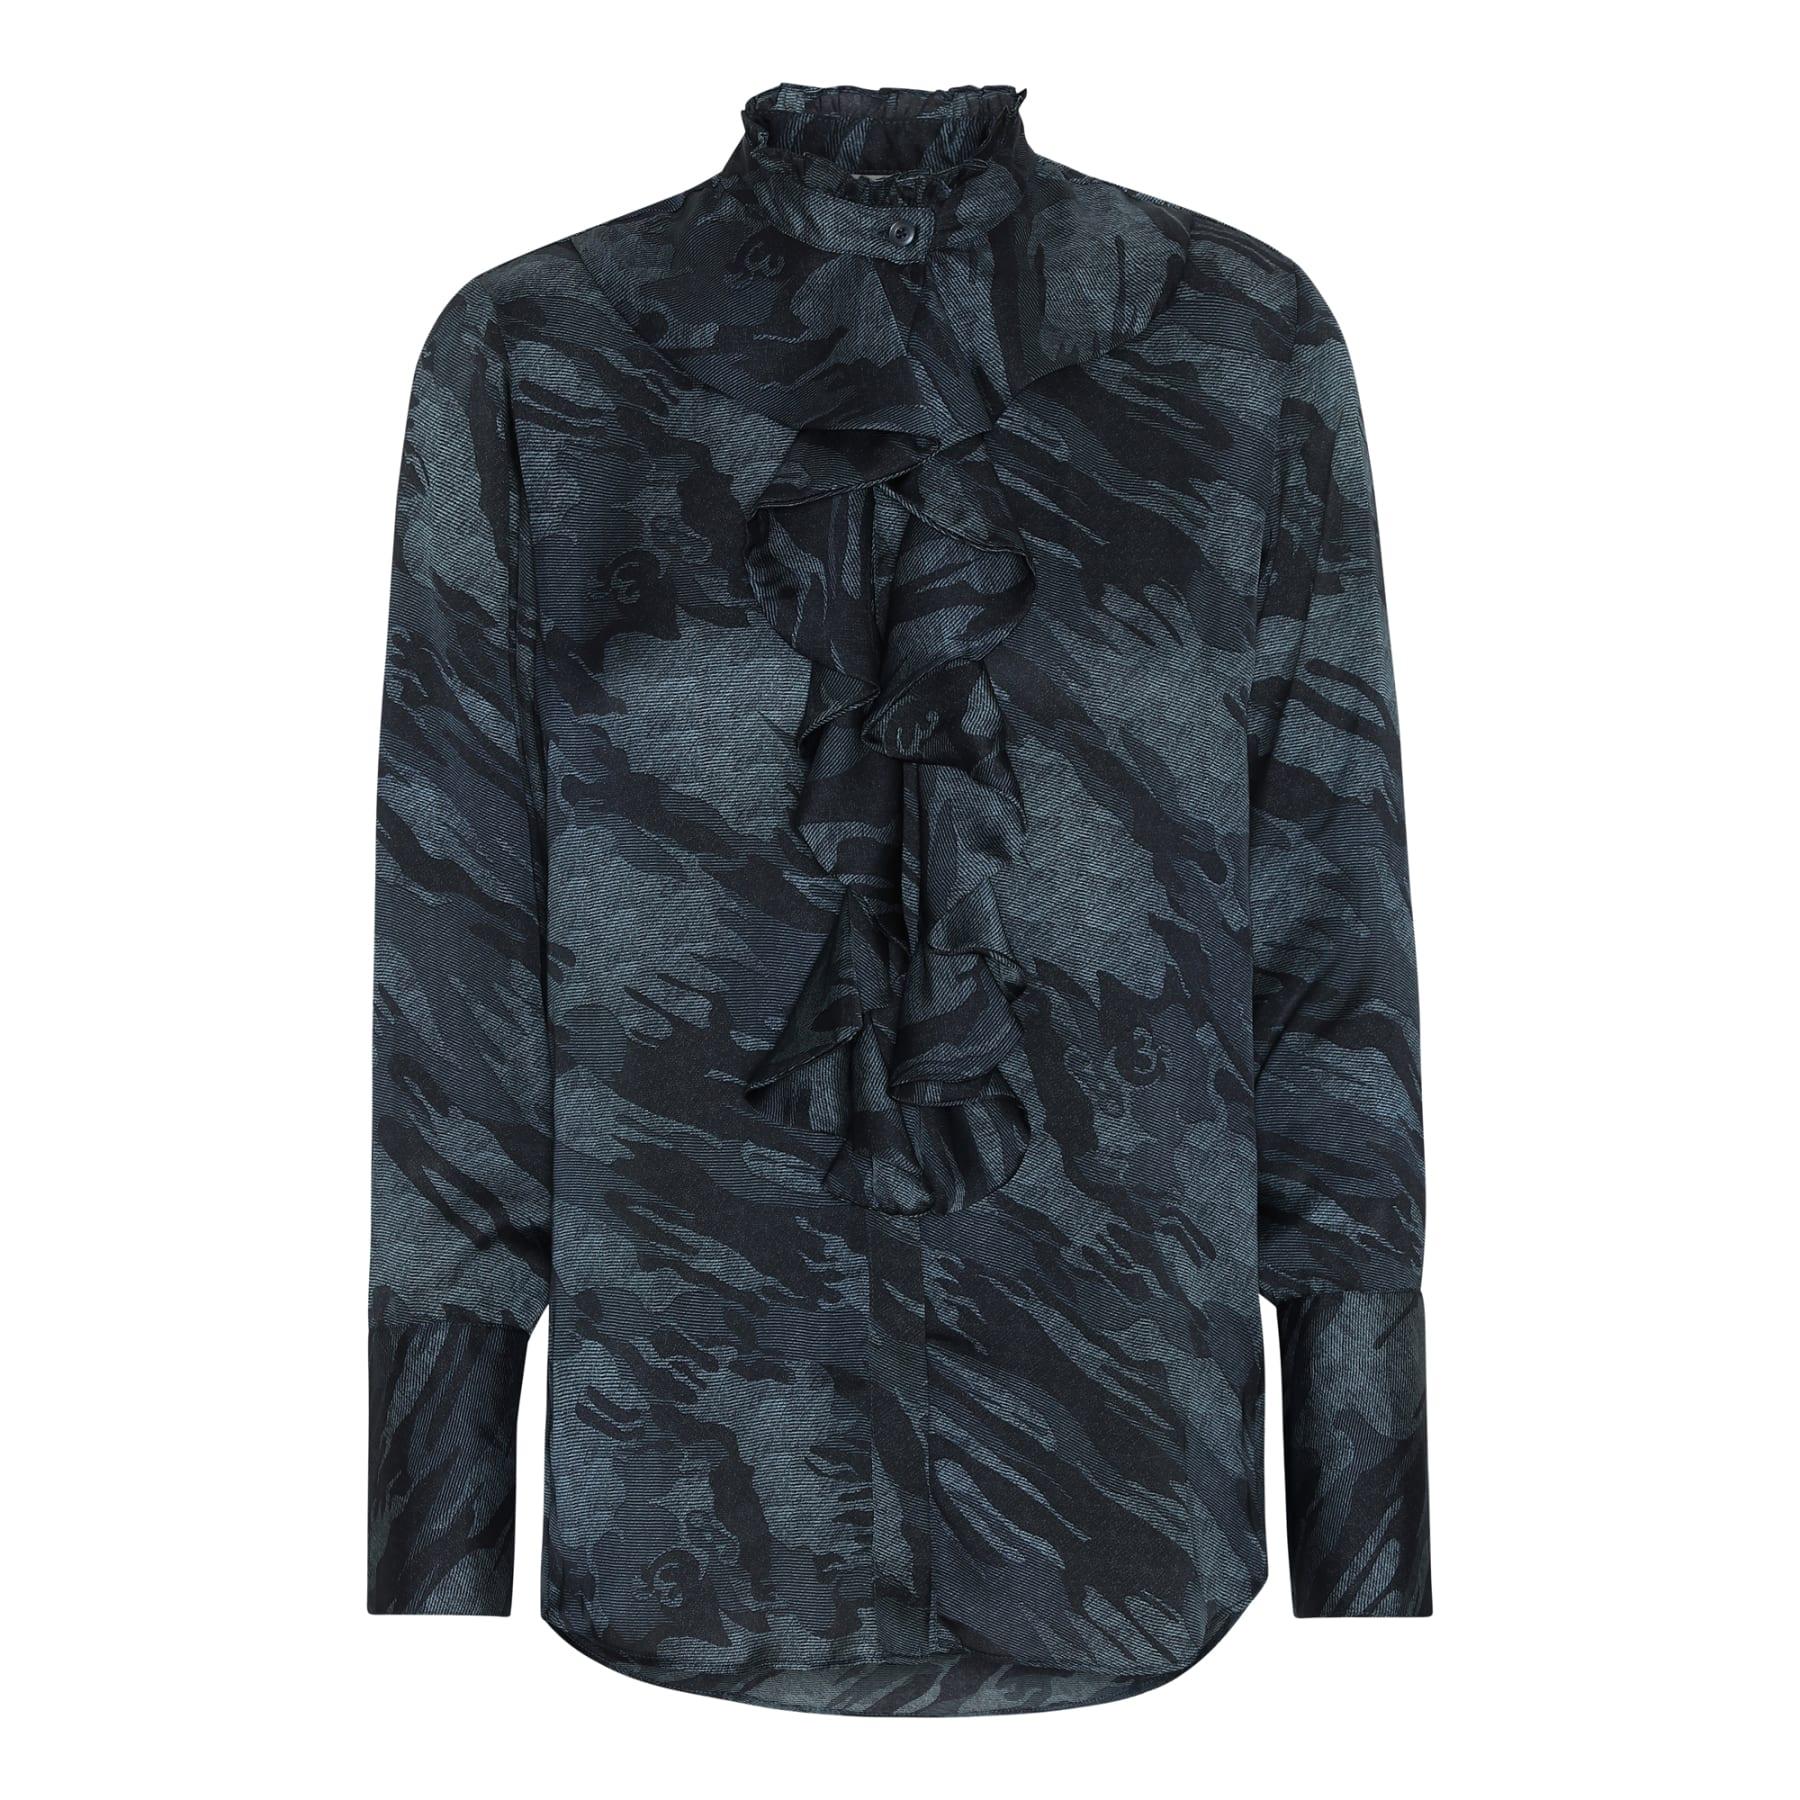 Stella Shirt - Blue Camouflage karmamia image by me